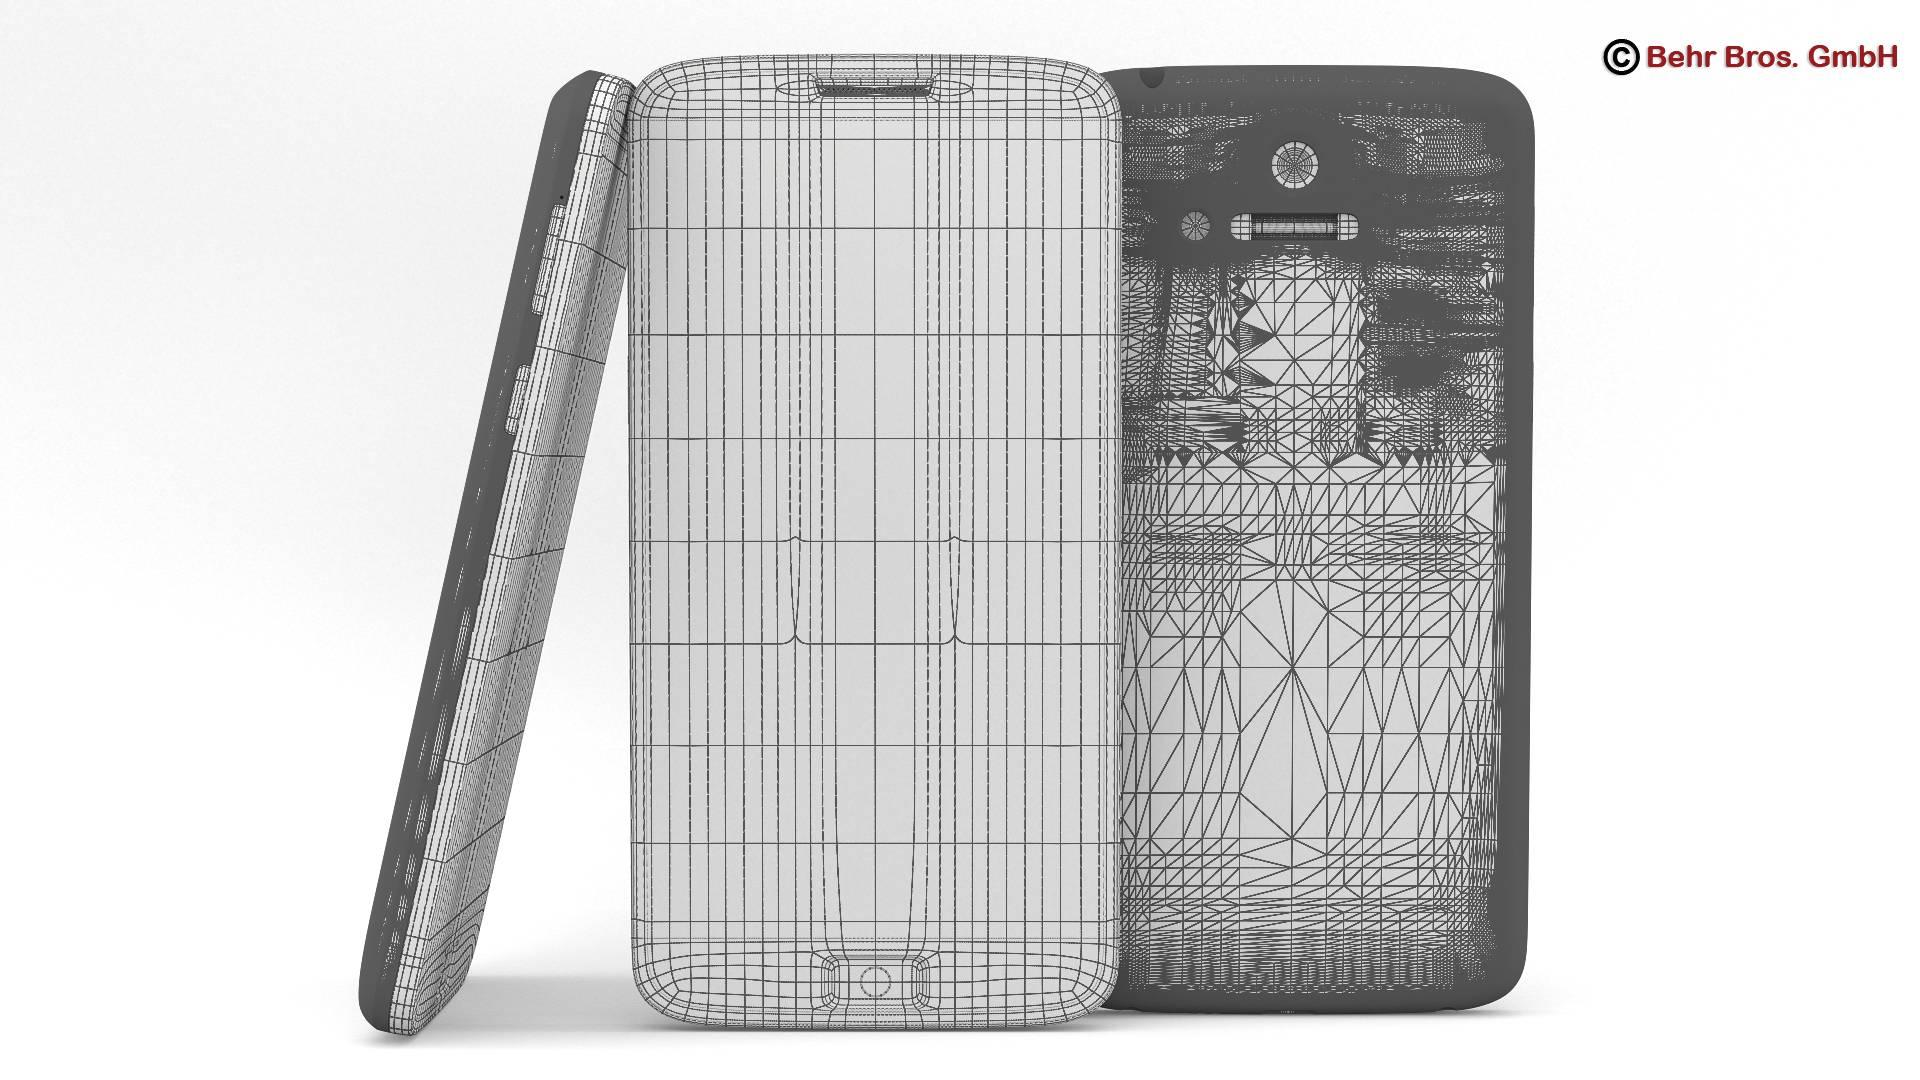 generic smartphone 4.6 inch 3d model 3ds max fbx c4d lwo ma mb obj 161645